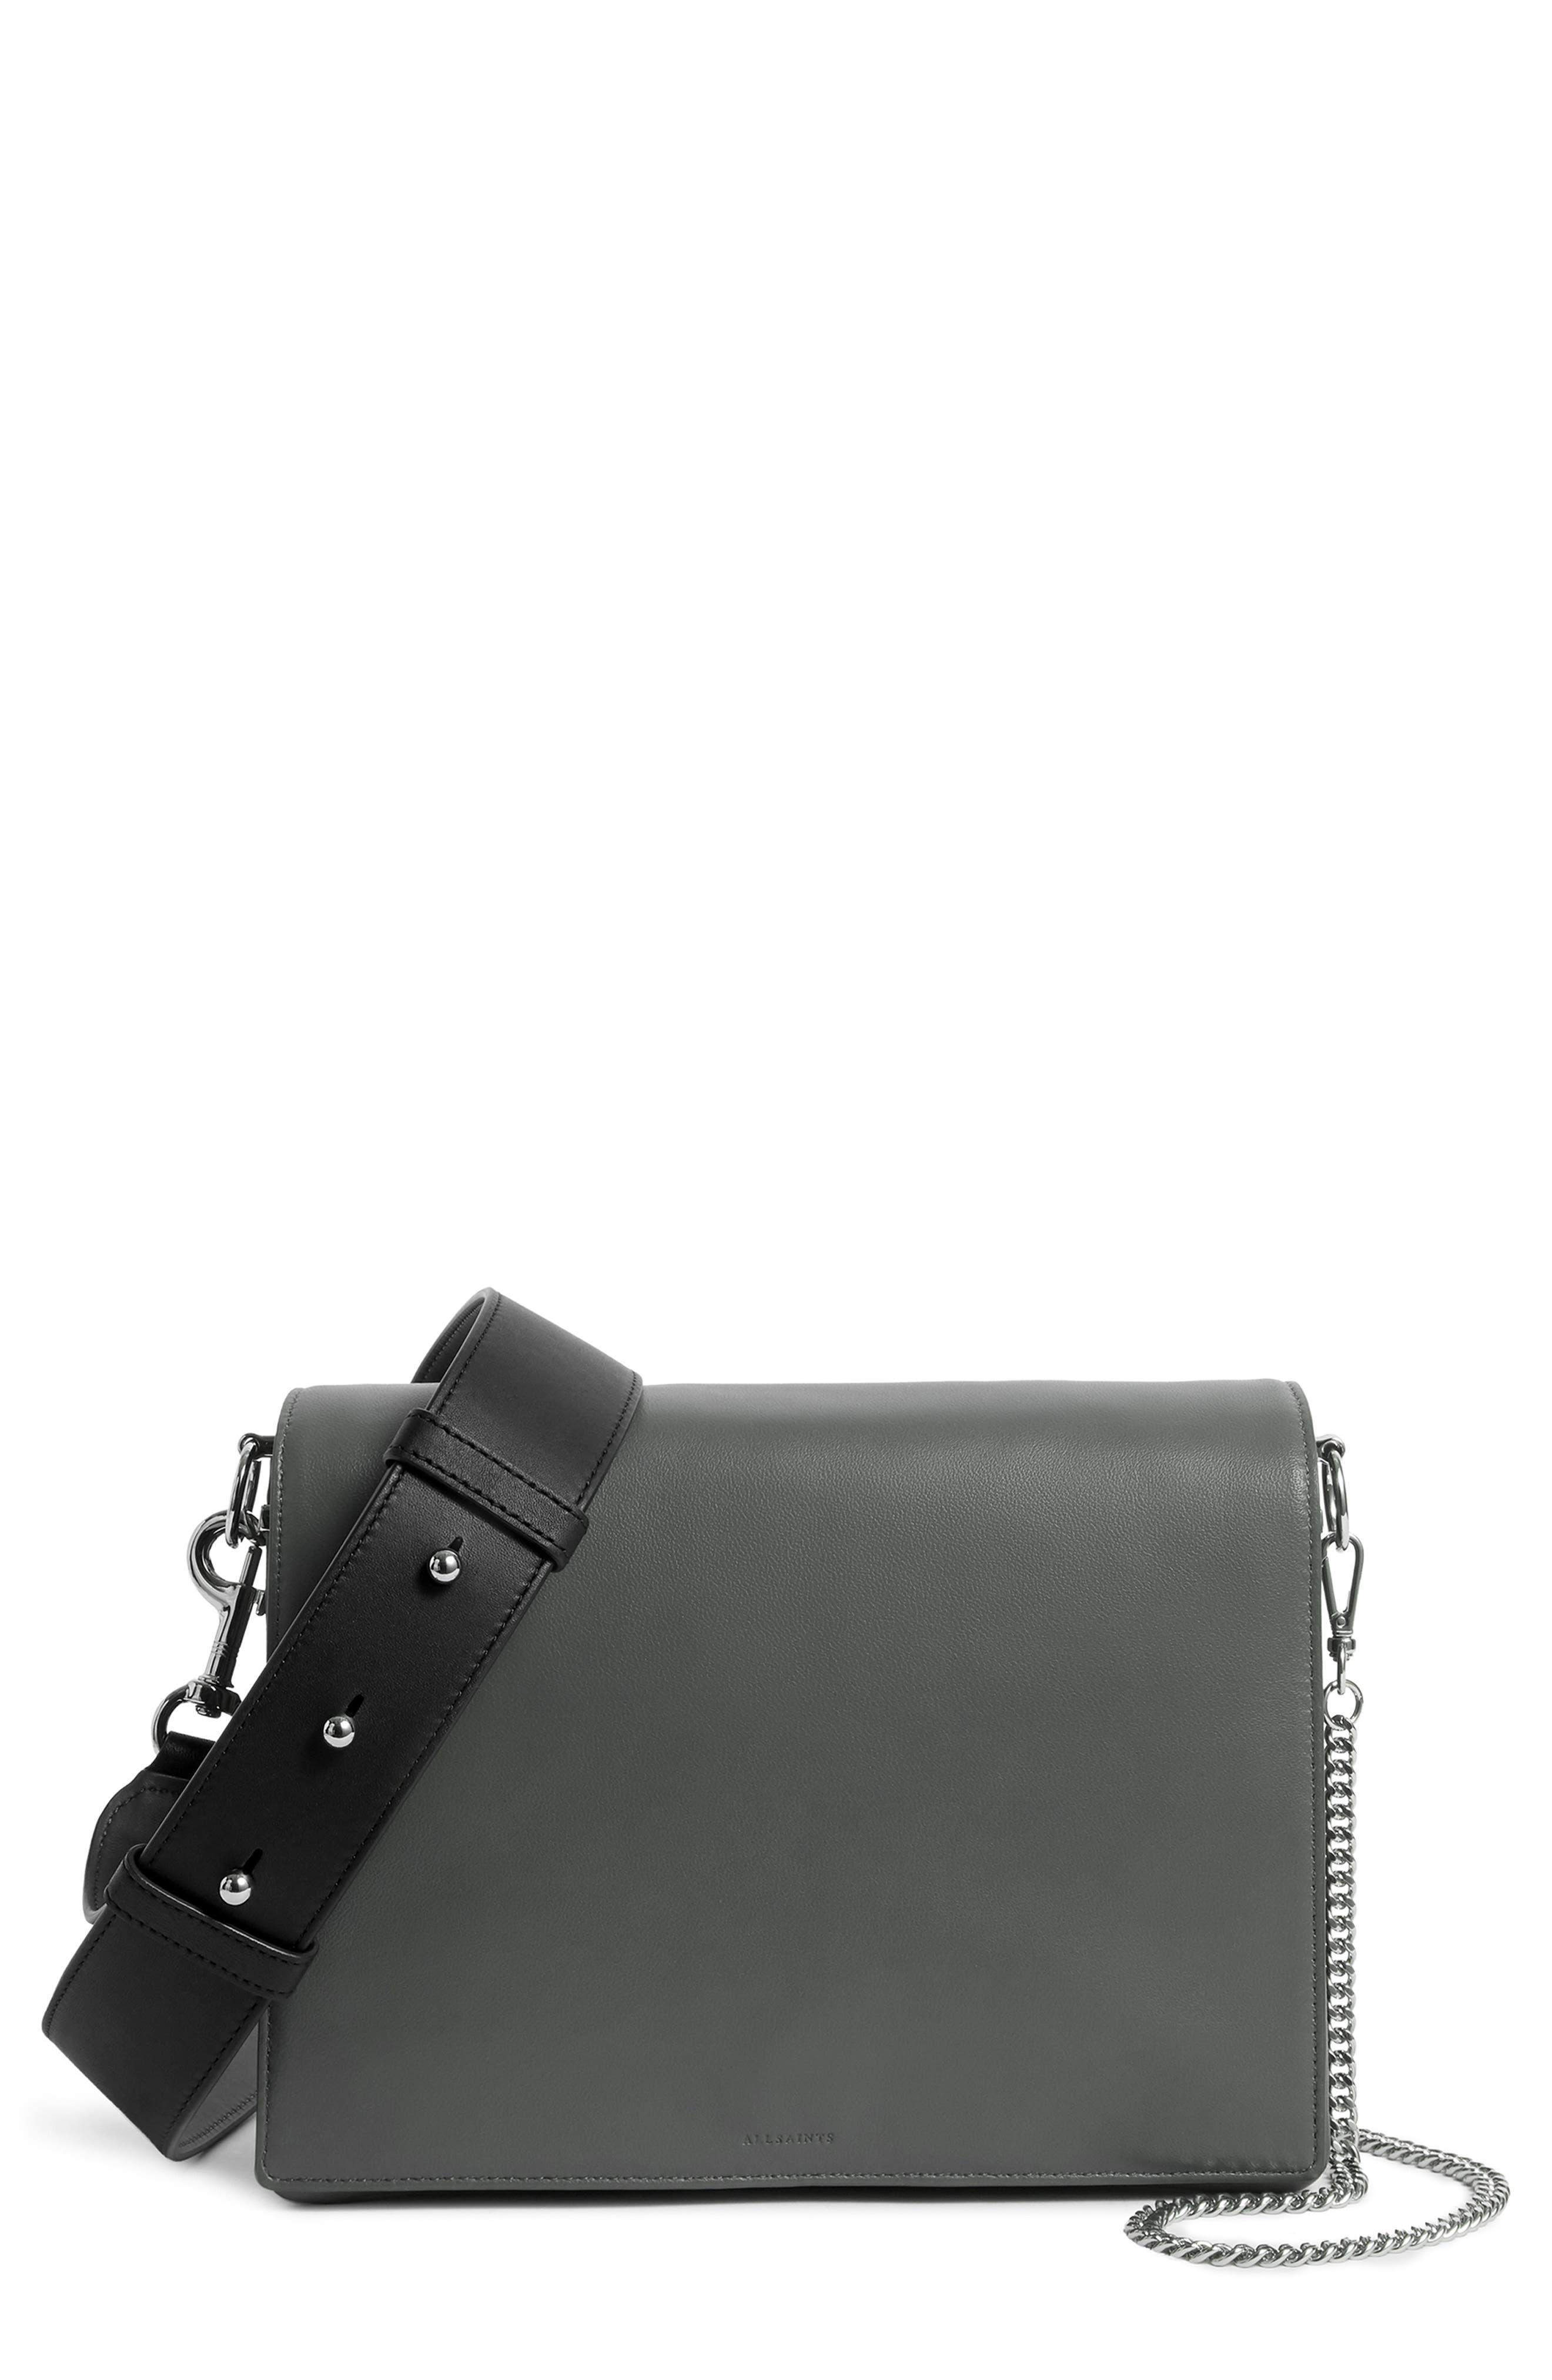 Zep Lambskin Leather Box Bag,                             Main thumbnail 1, color,                             SMOKY BLUE/ DARK BLUE